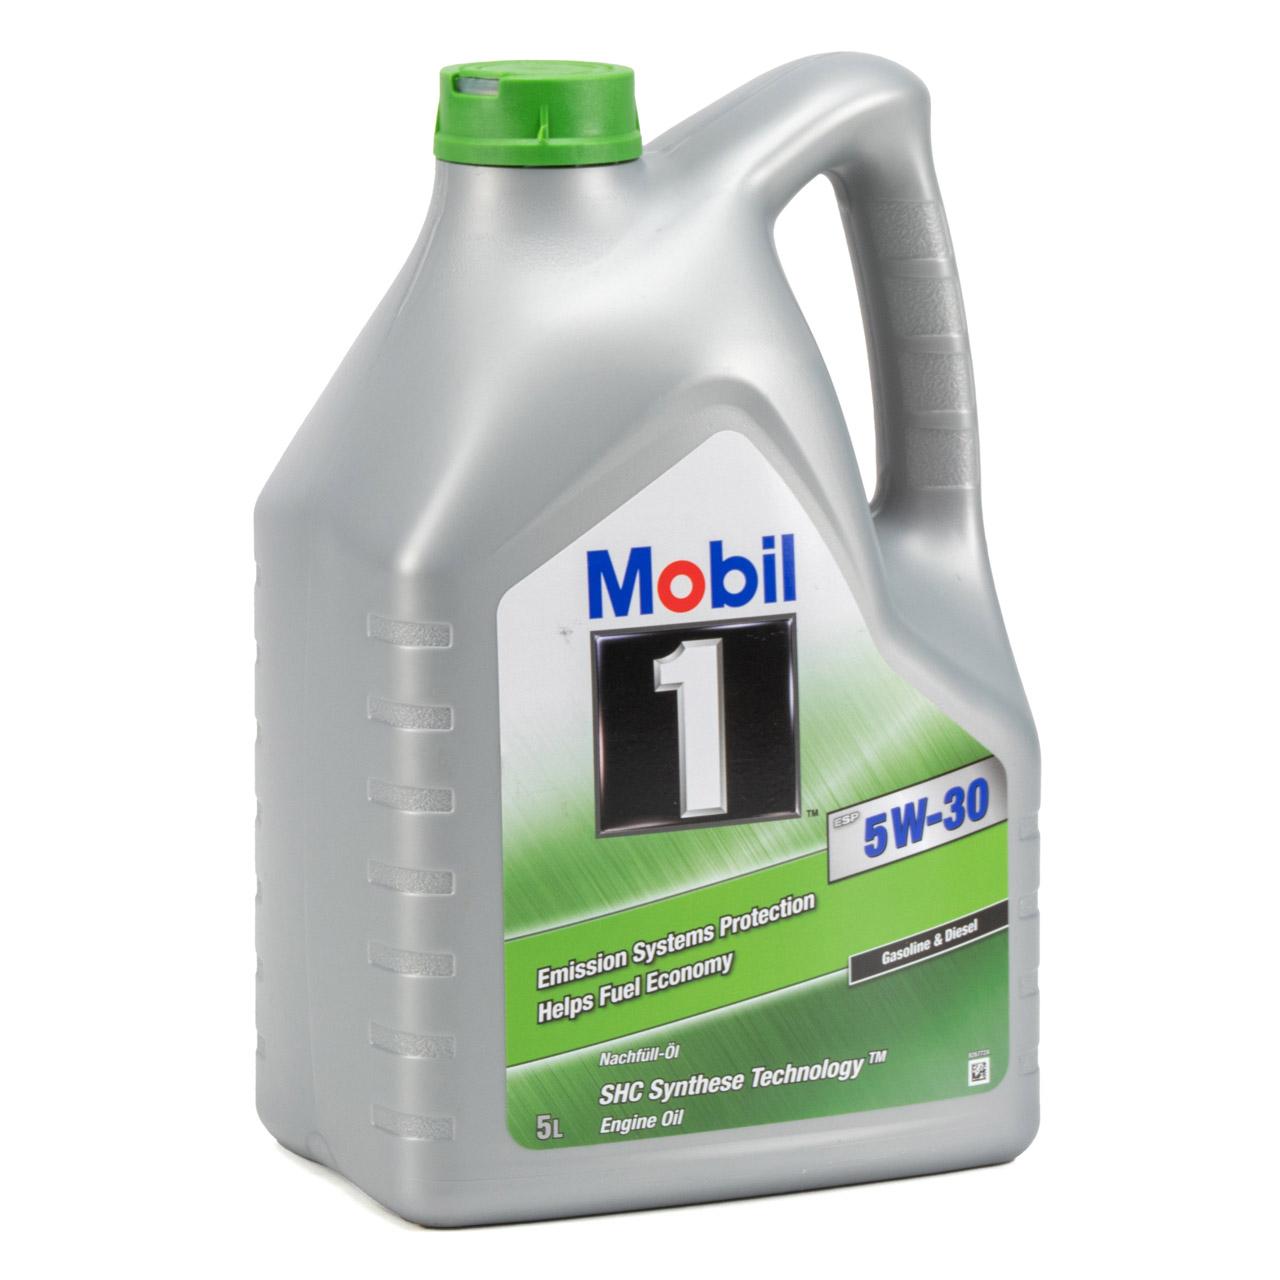 Mobil 1 ESP Motoröl Öl 5W-30 5W30 dexos2 PORSCHE C30 VW 504.00/507.00 - 5 Liter